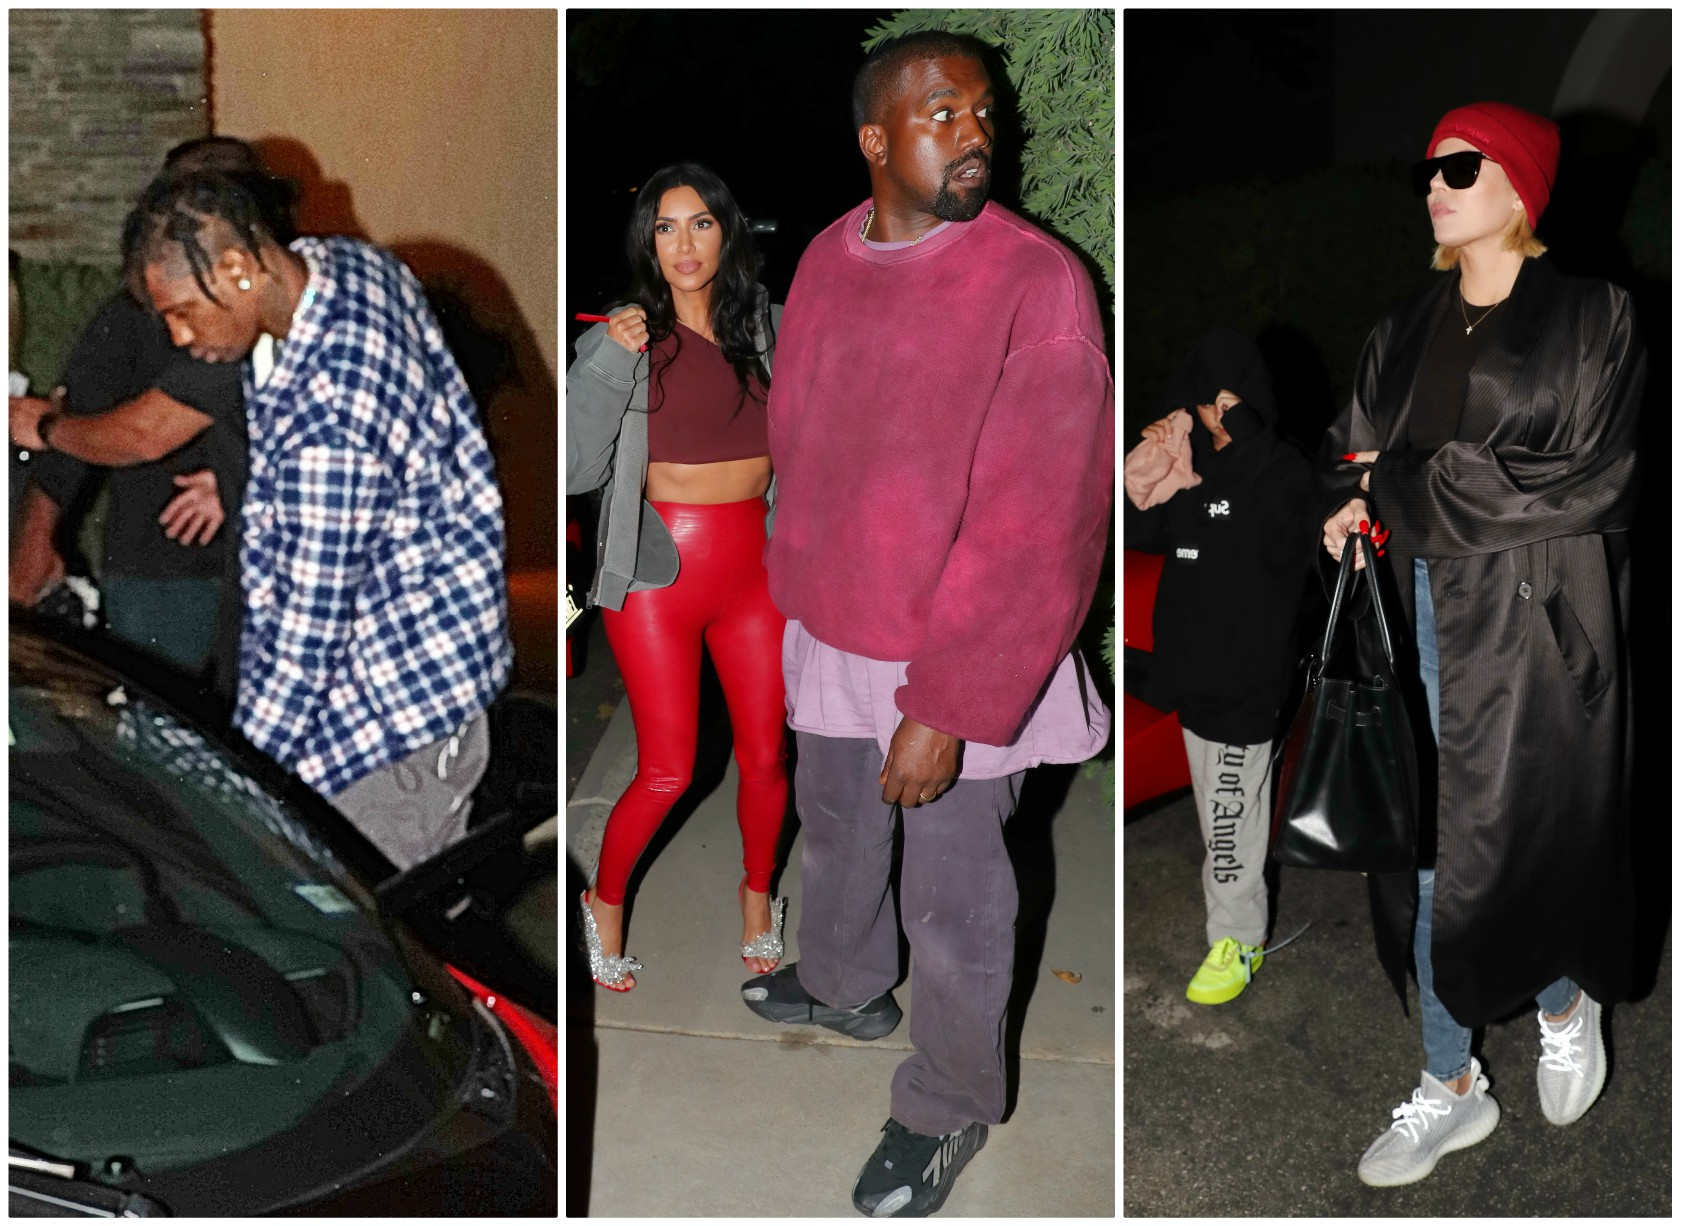 The Kardashians Celebrate Travis Scott's Birthday At The Movie Theater In Westlake Village, California